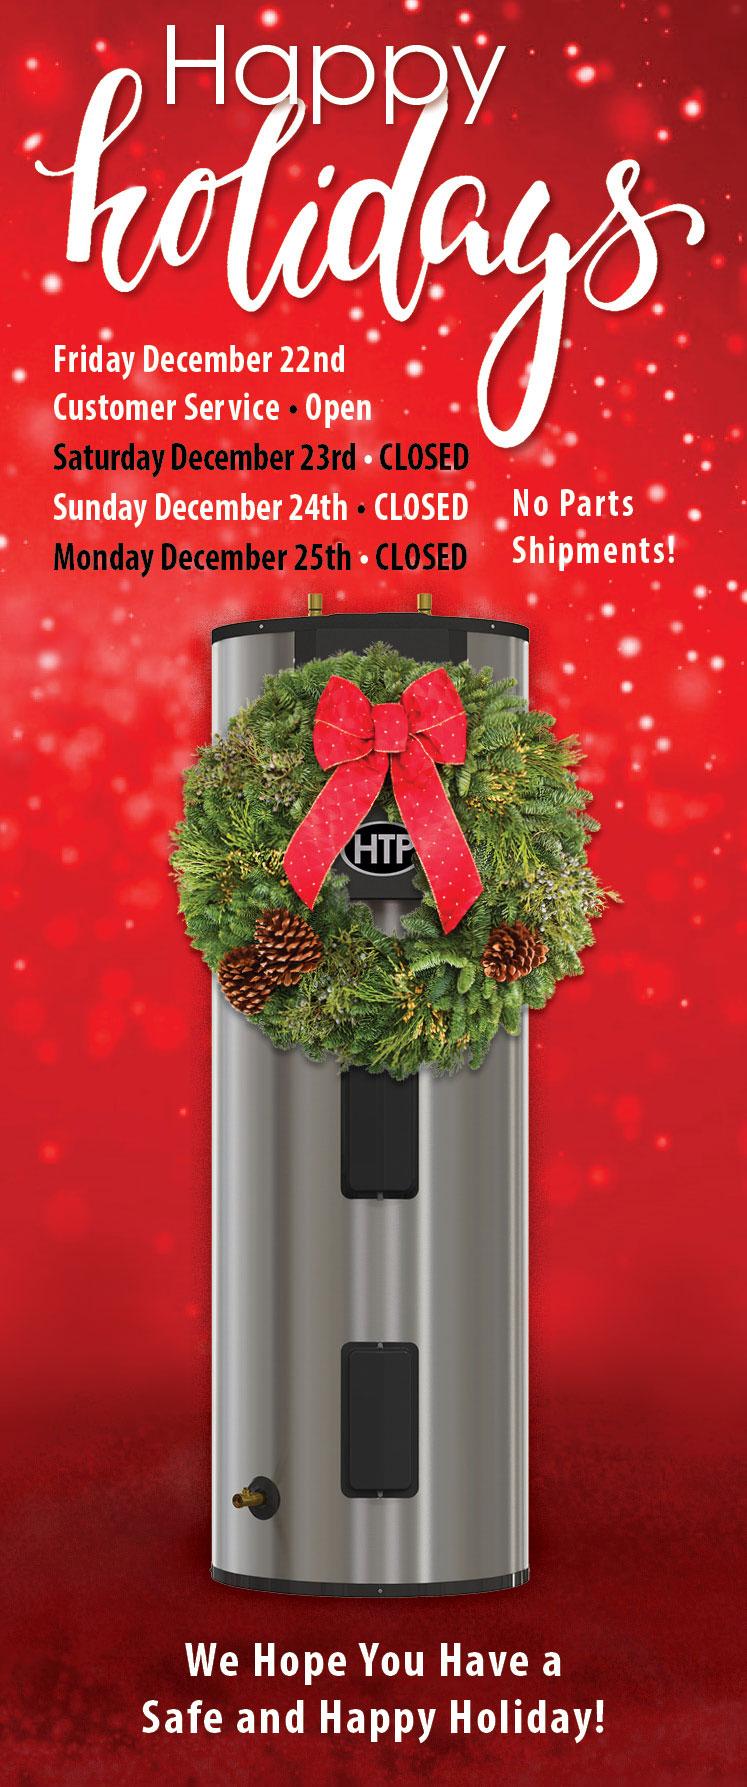 Email-Christmas333-1.jpg